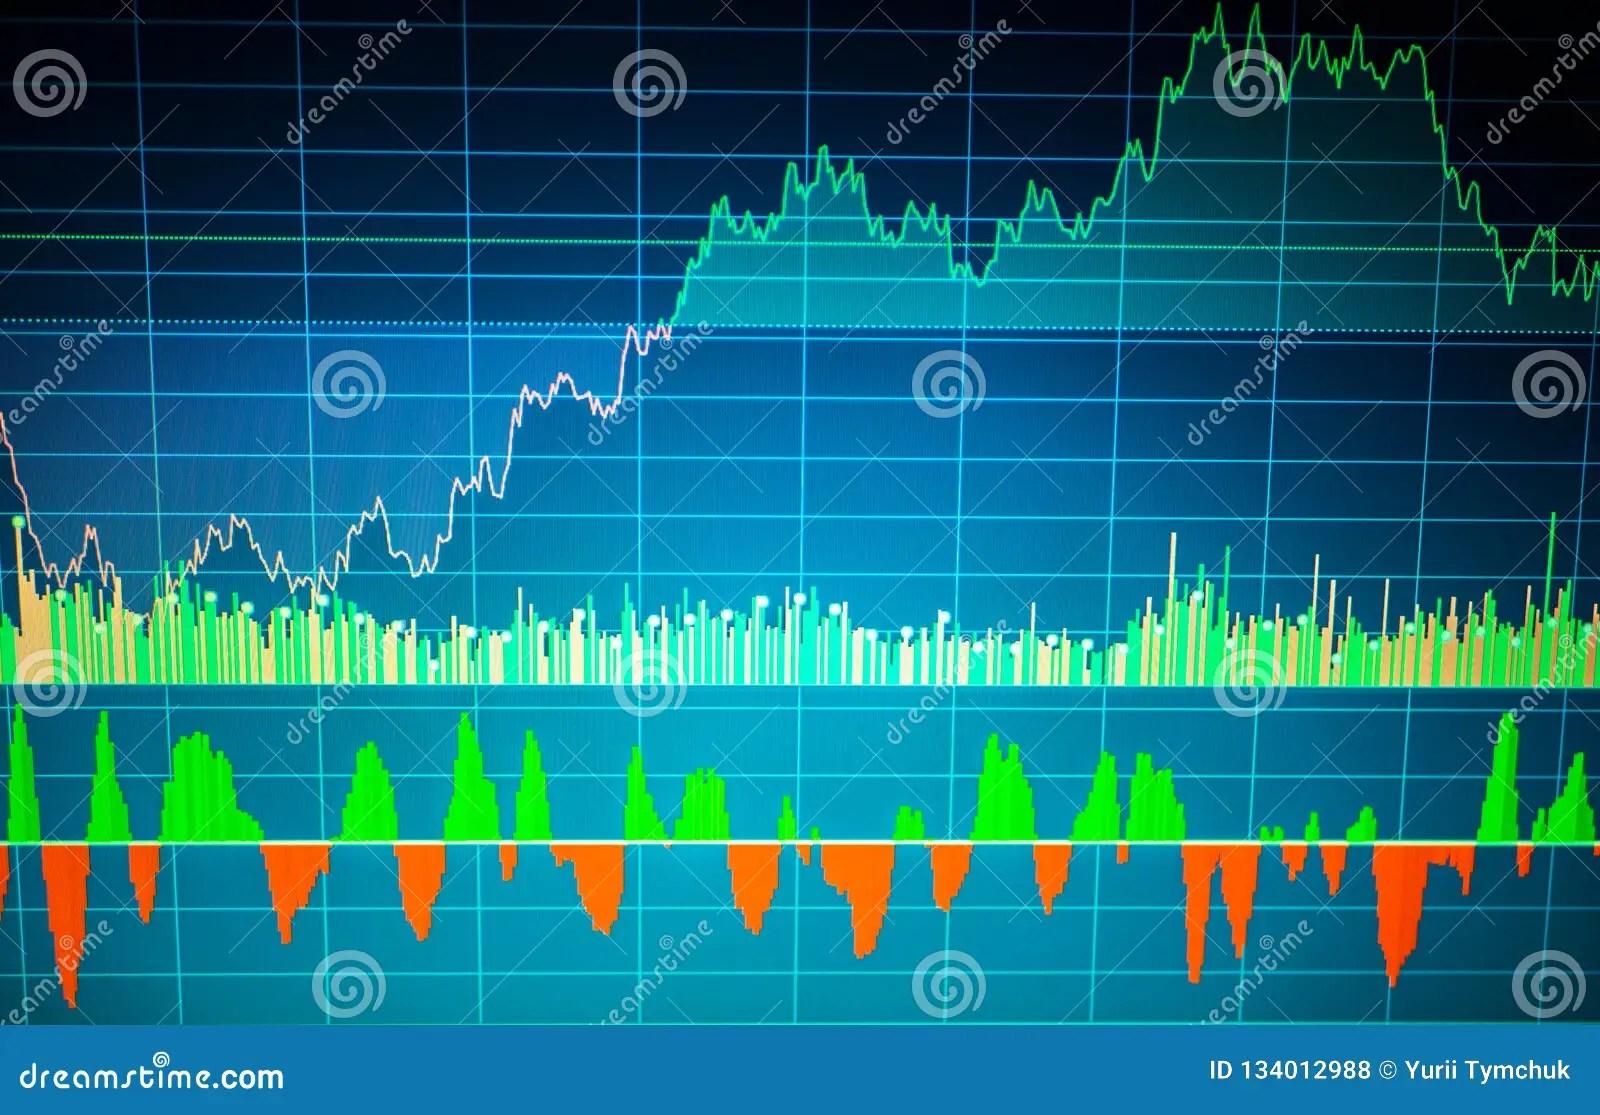 world economics graph conceptual